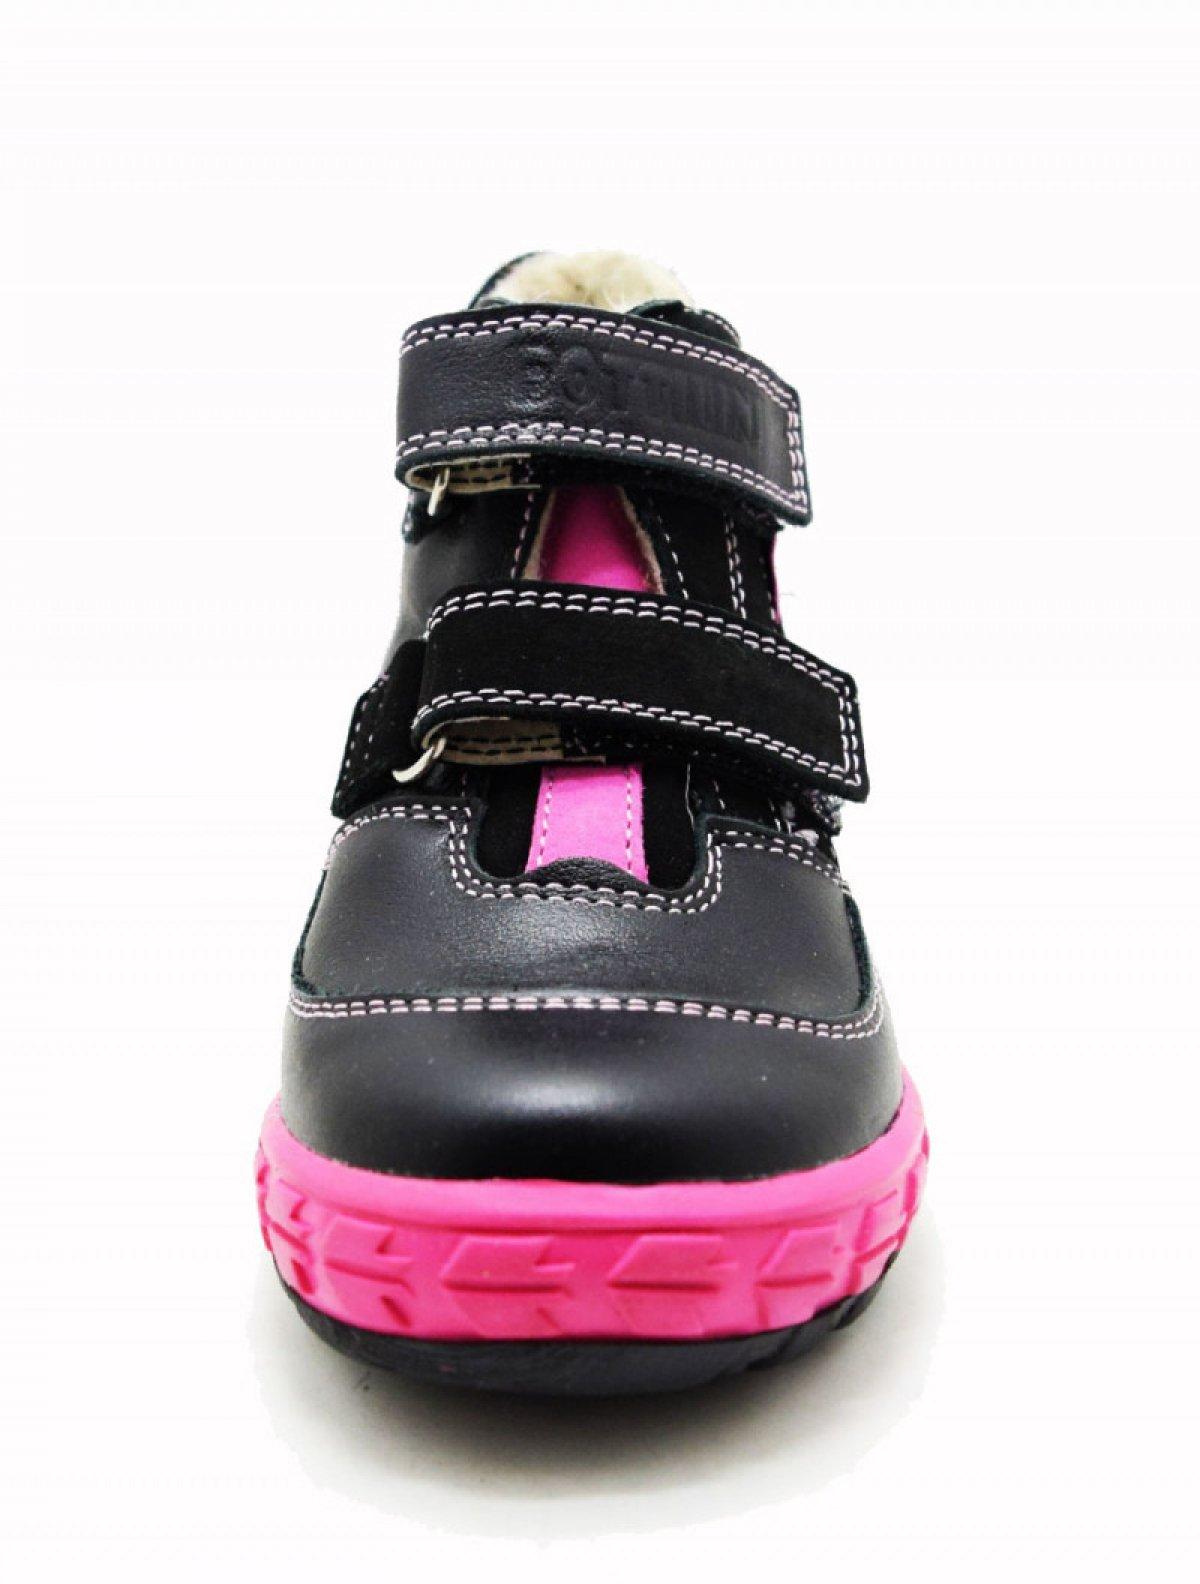 Bottilini BL-129(1) ботинки для девочки